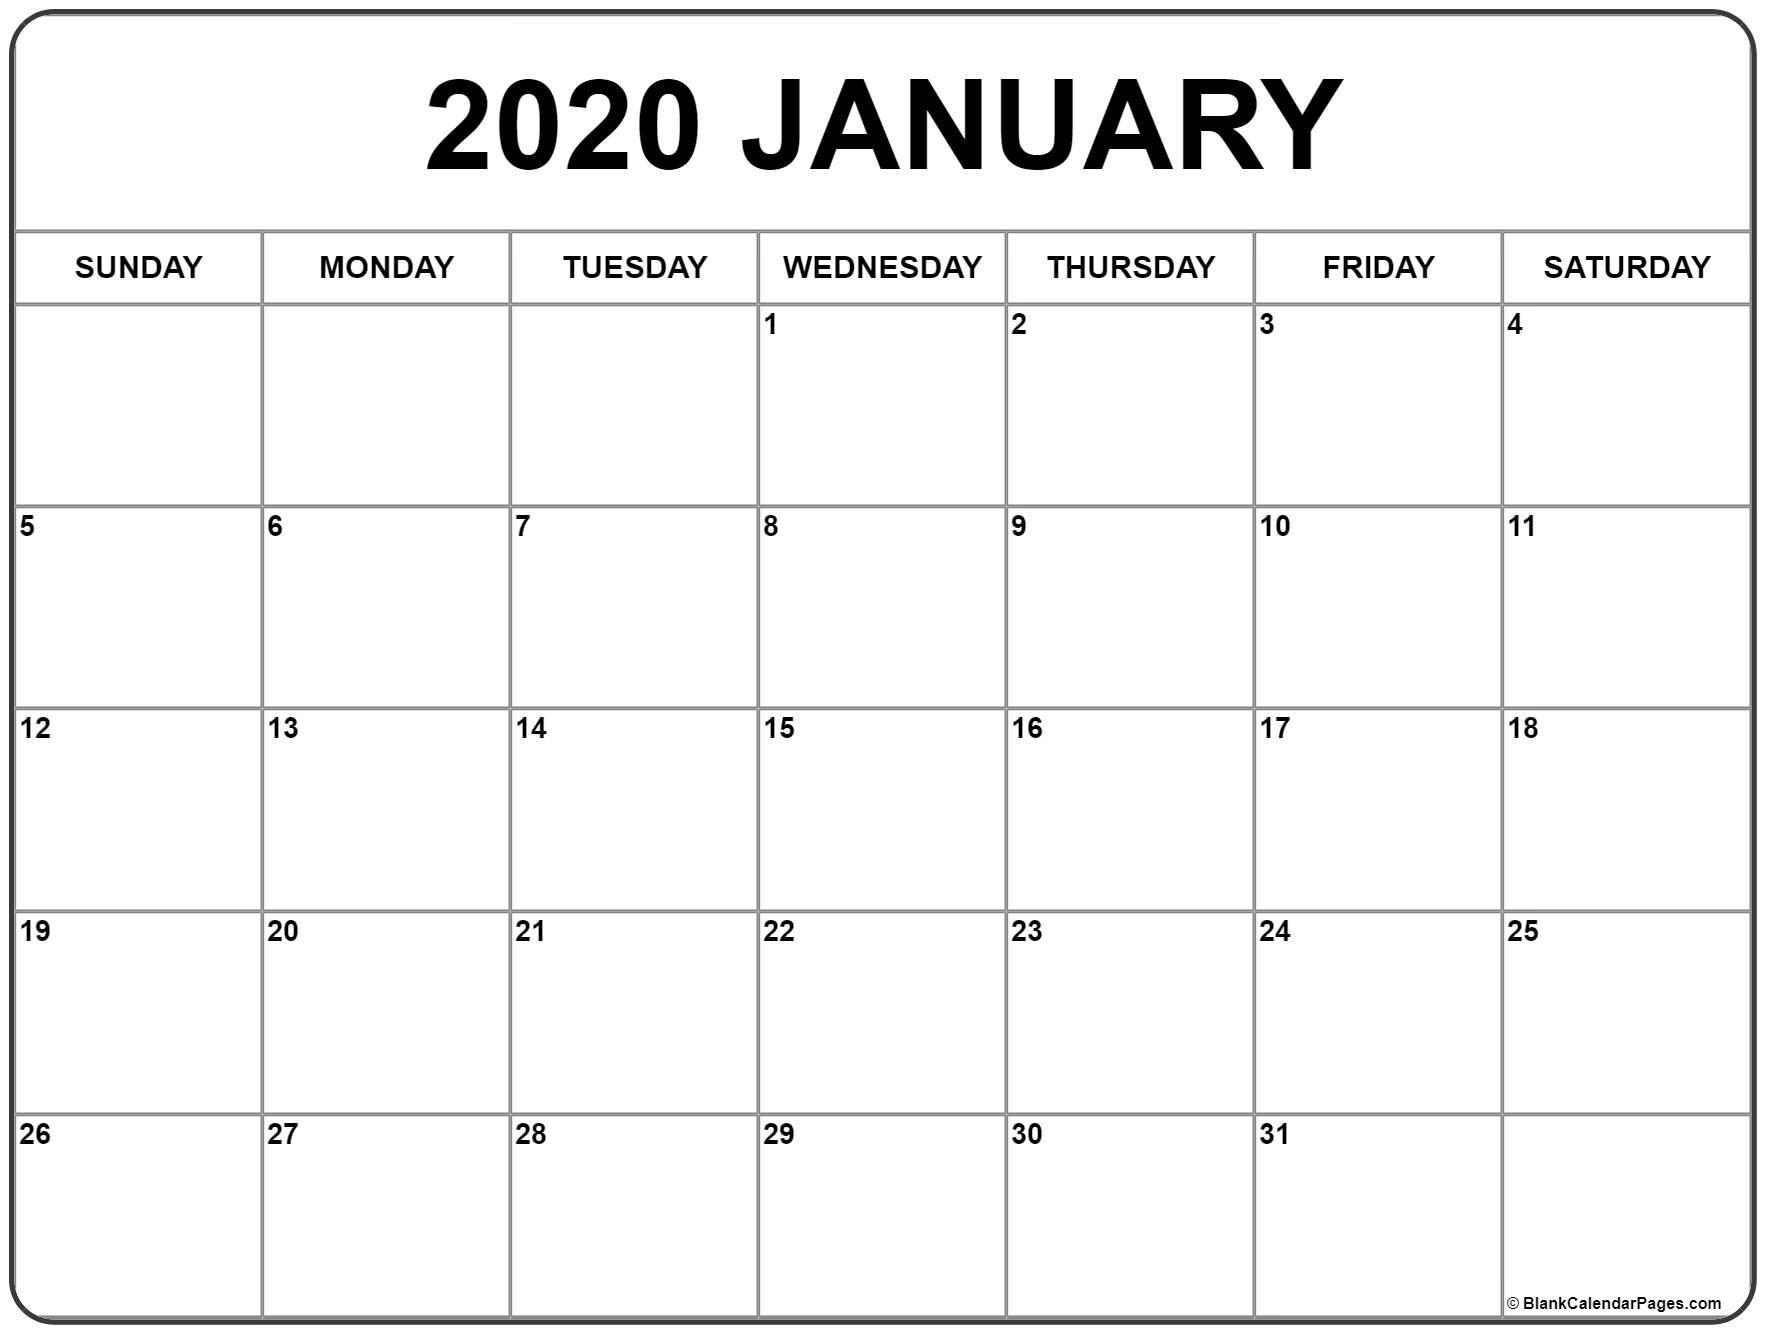 January 2020 Calendar | Free Printable Monthly Calendars-Pretty January 2020 Calendar